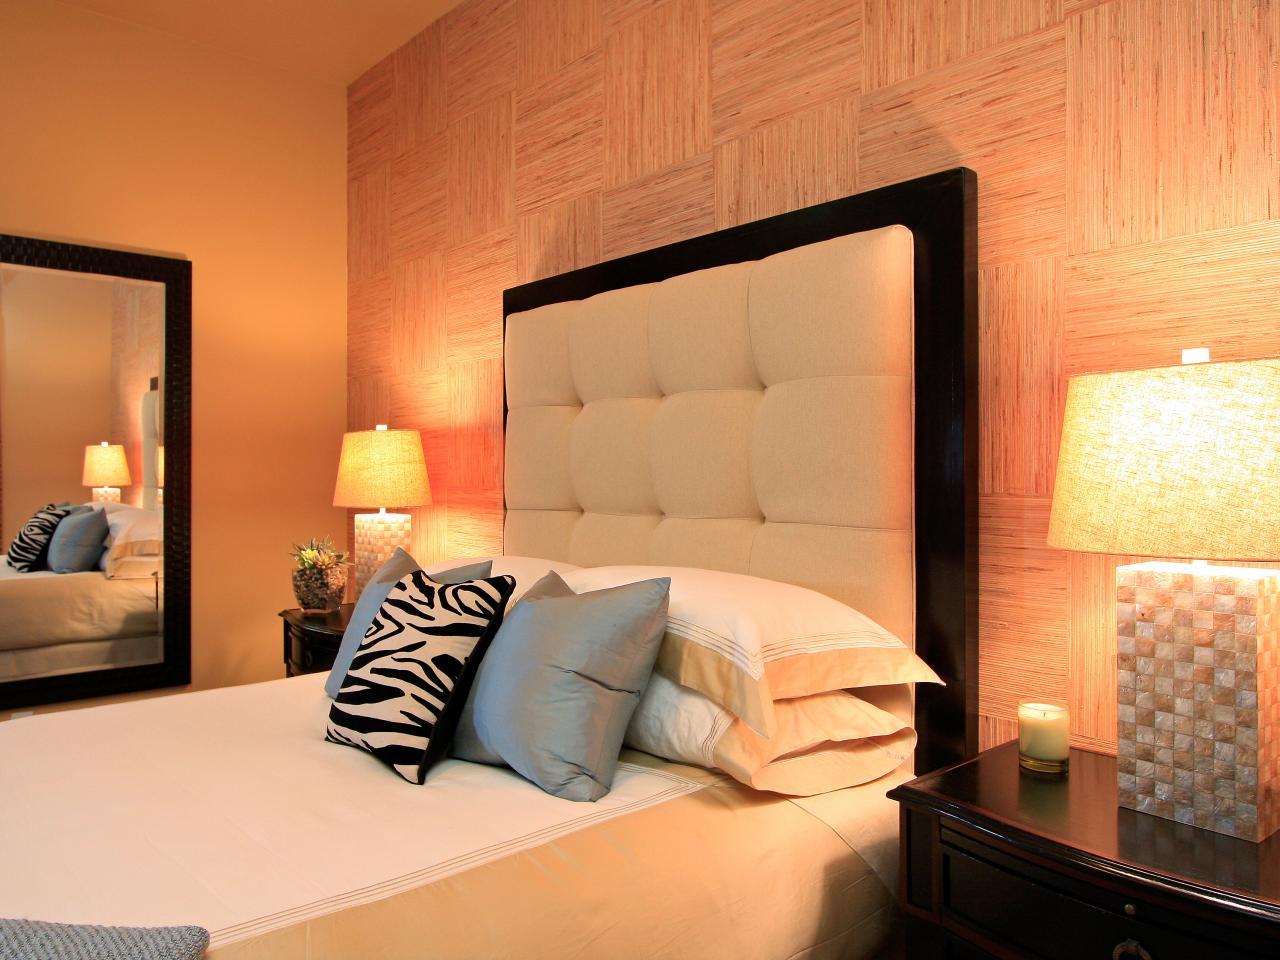 Bed Headboard Decoration Methods: Photos & Tips - Small Design Ideas